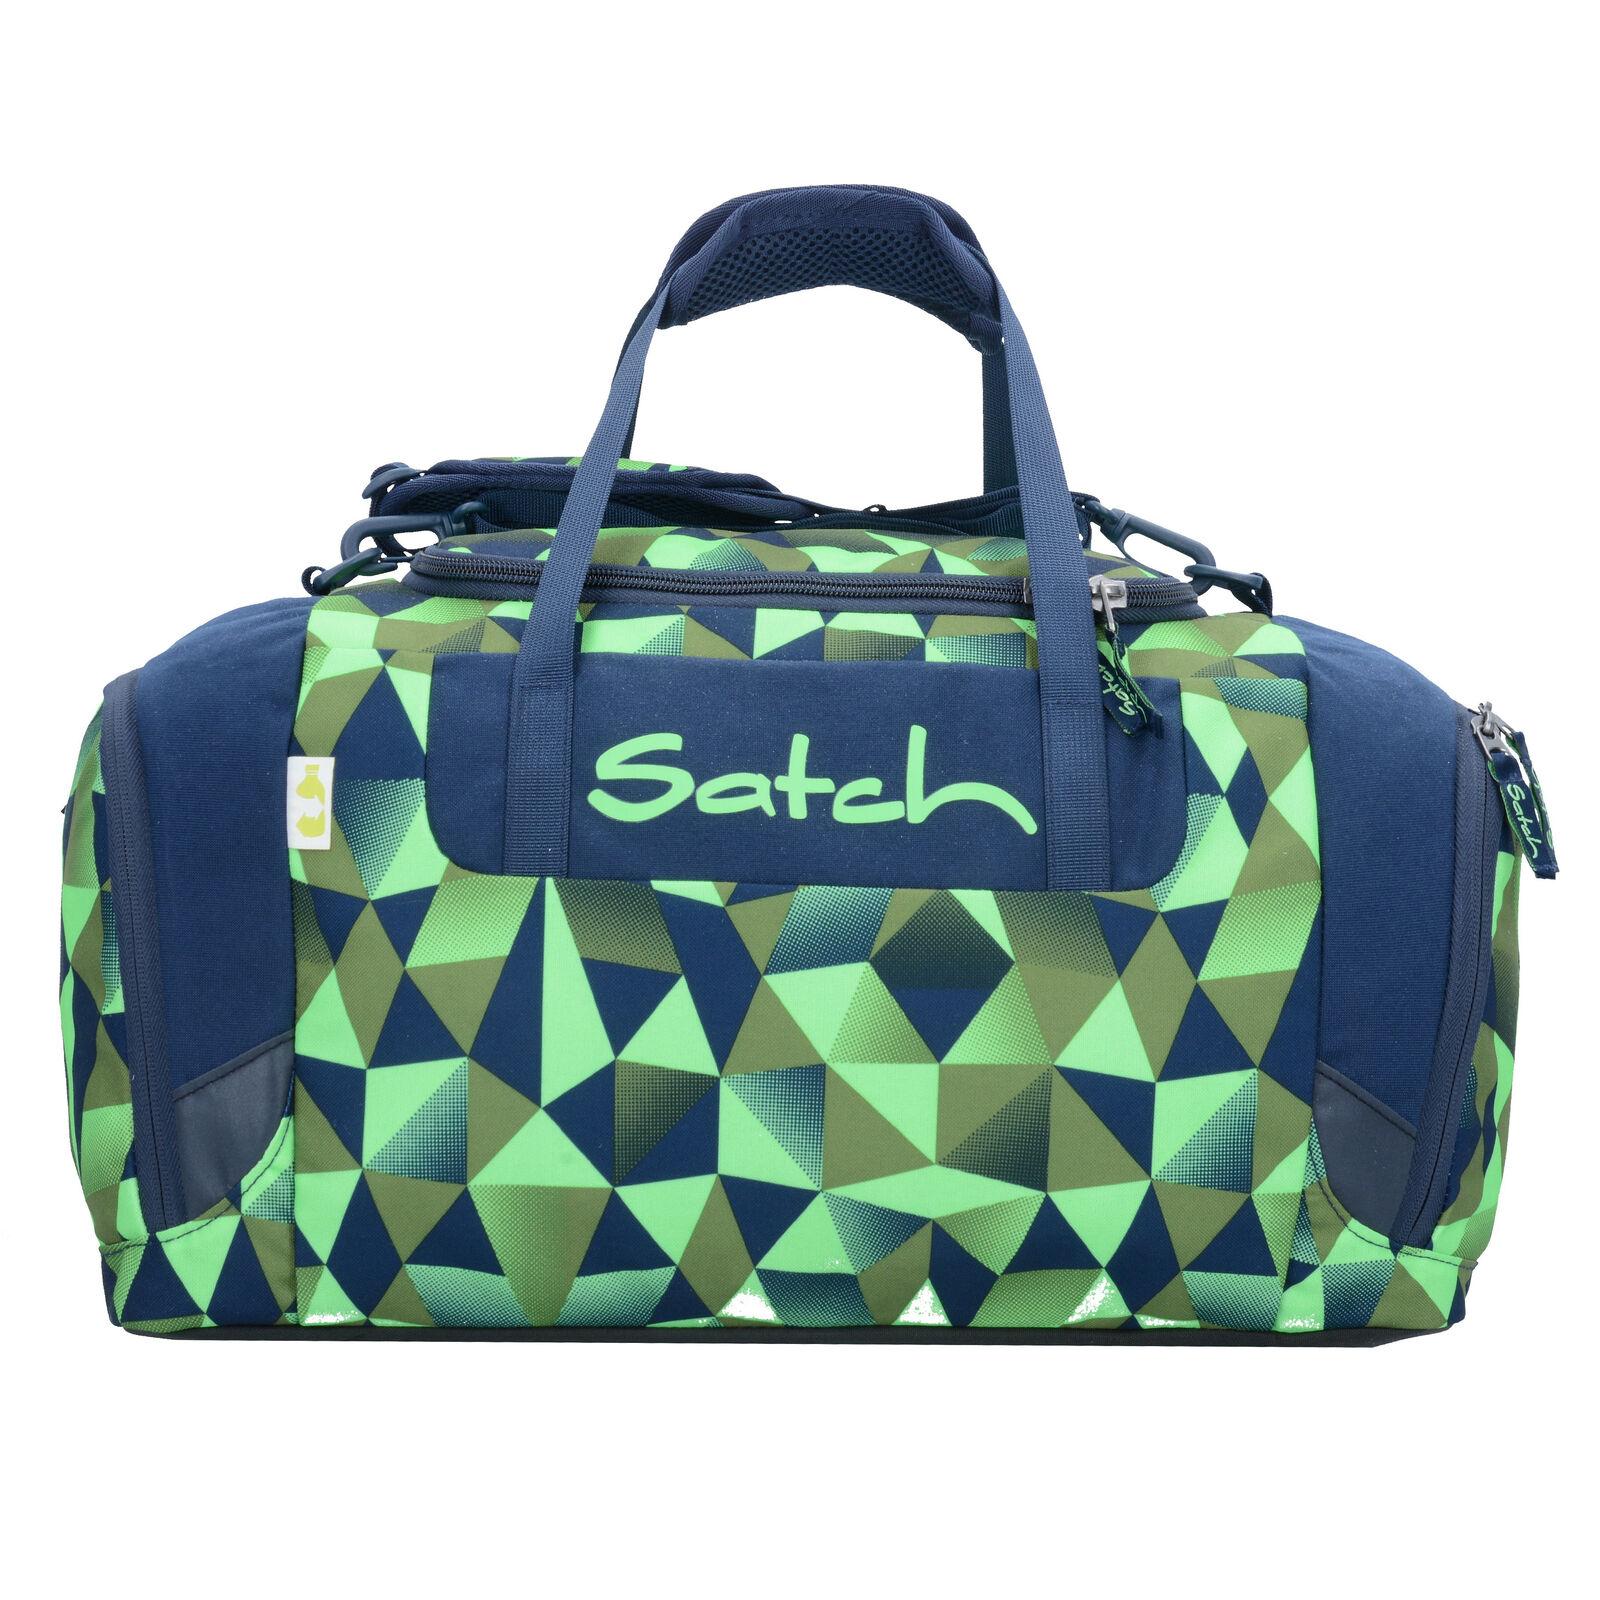 Satch Duffle Bag Sports Bag 44 cm (blue green polygon fresh crush)